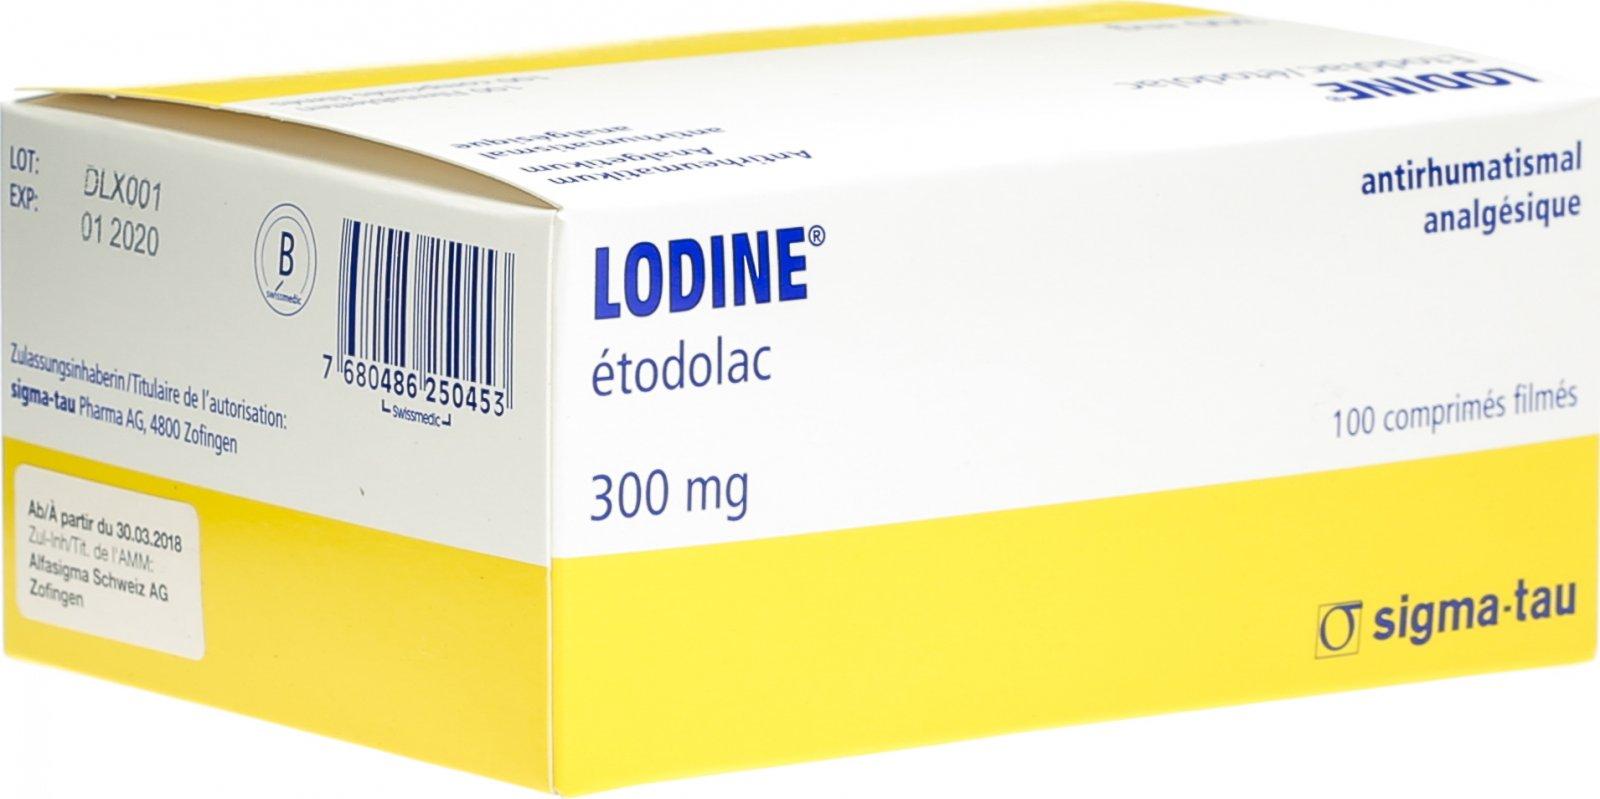 Lodine 300 Filmtabletten 300mg 100 Stück in der Adler Apotheke